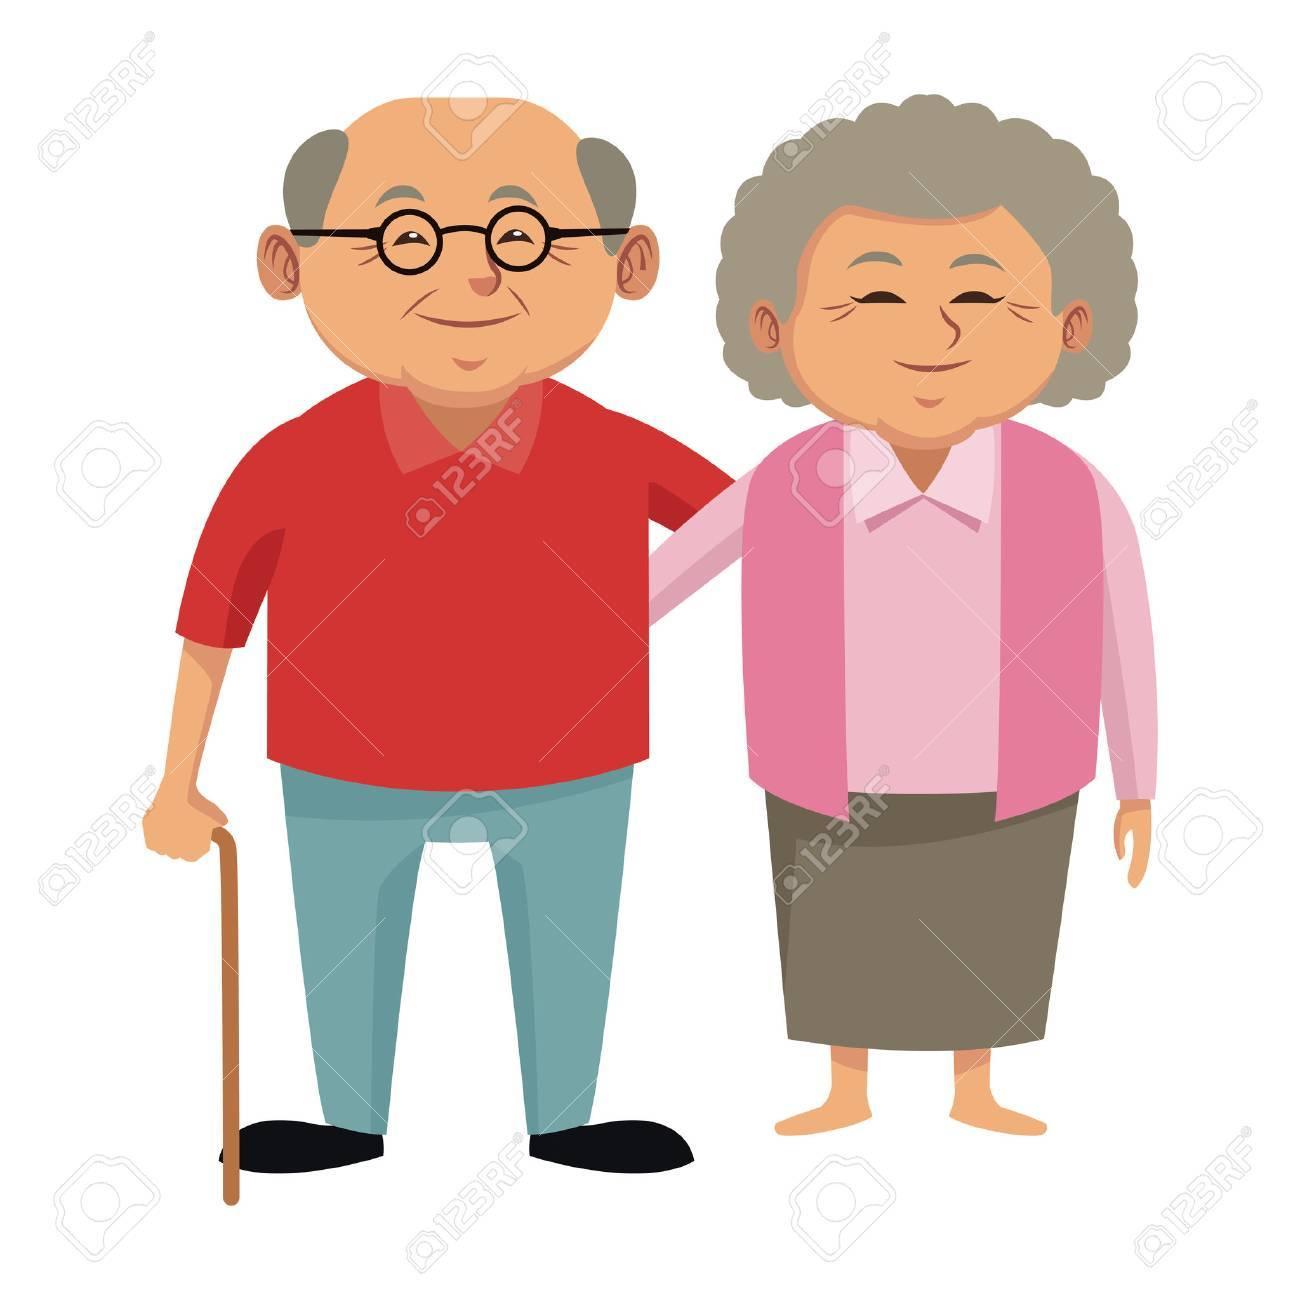 Cute grandparents couple cartoon icon vector illustration graphic design - 87224039